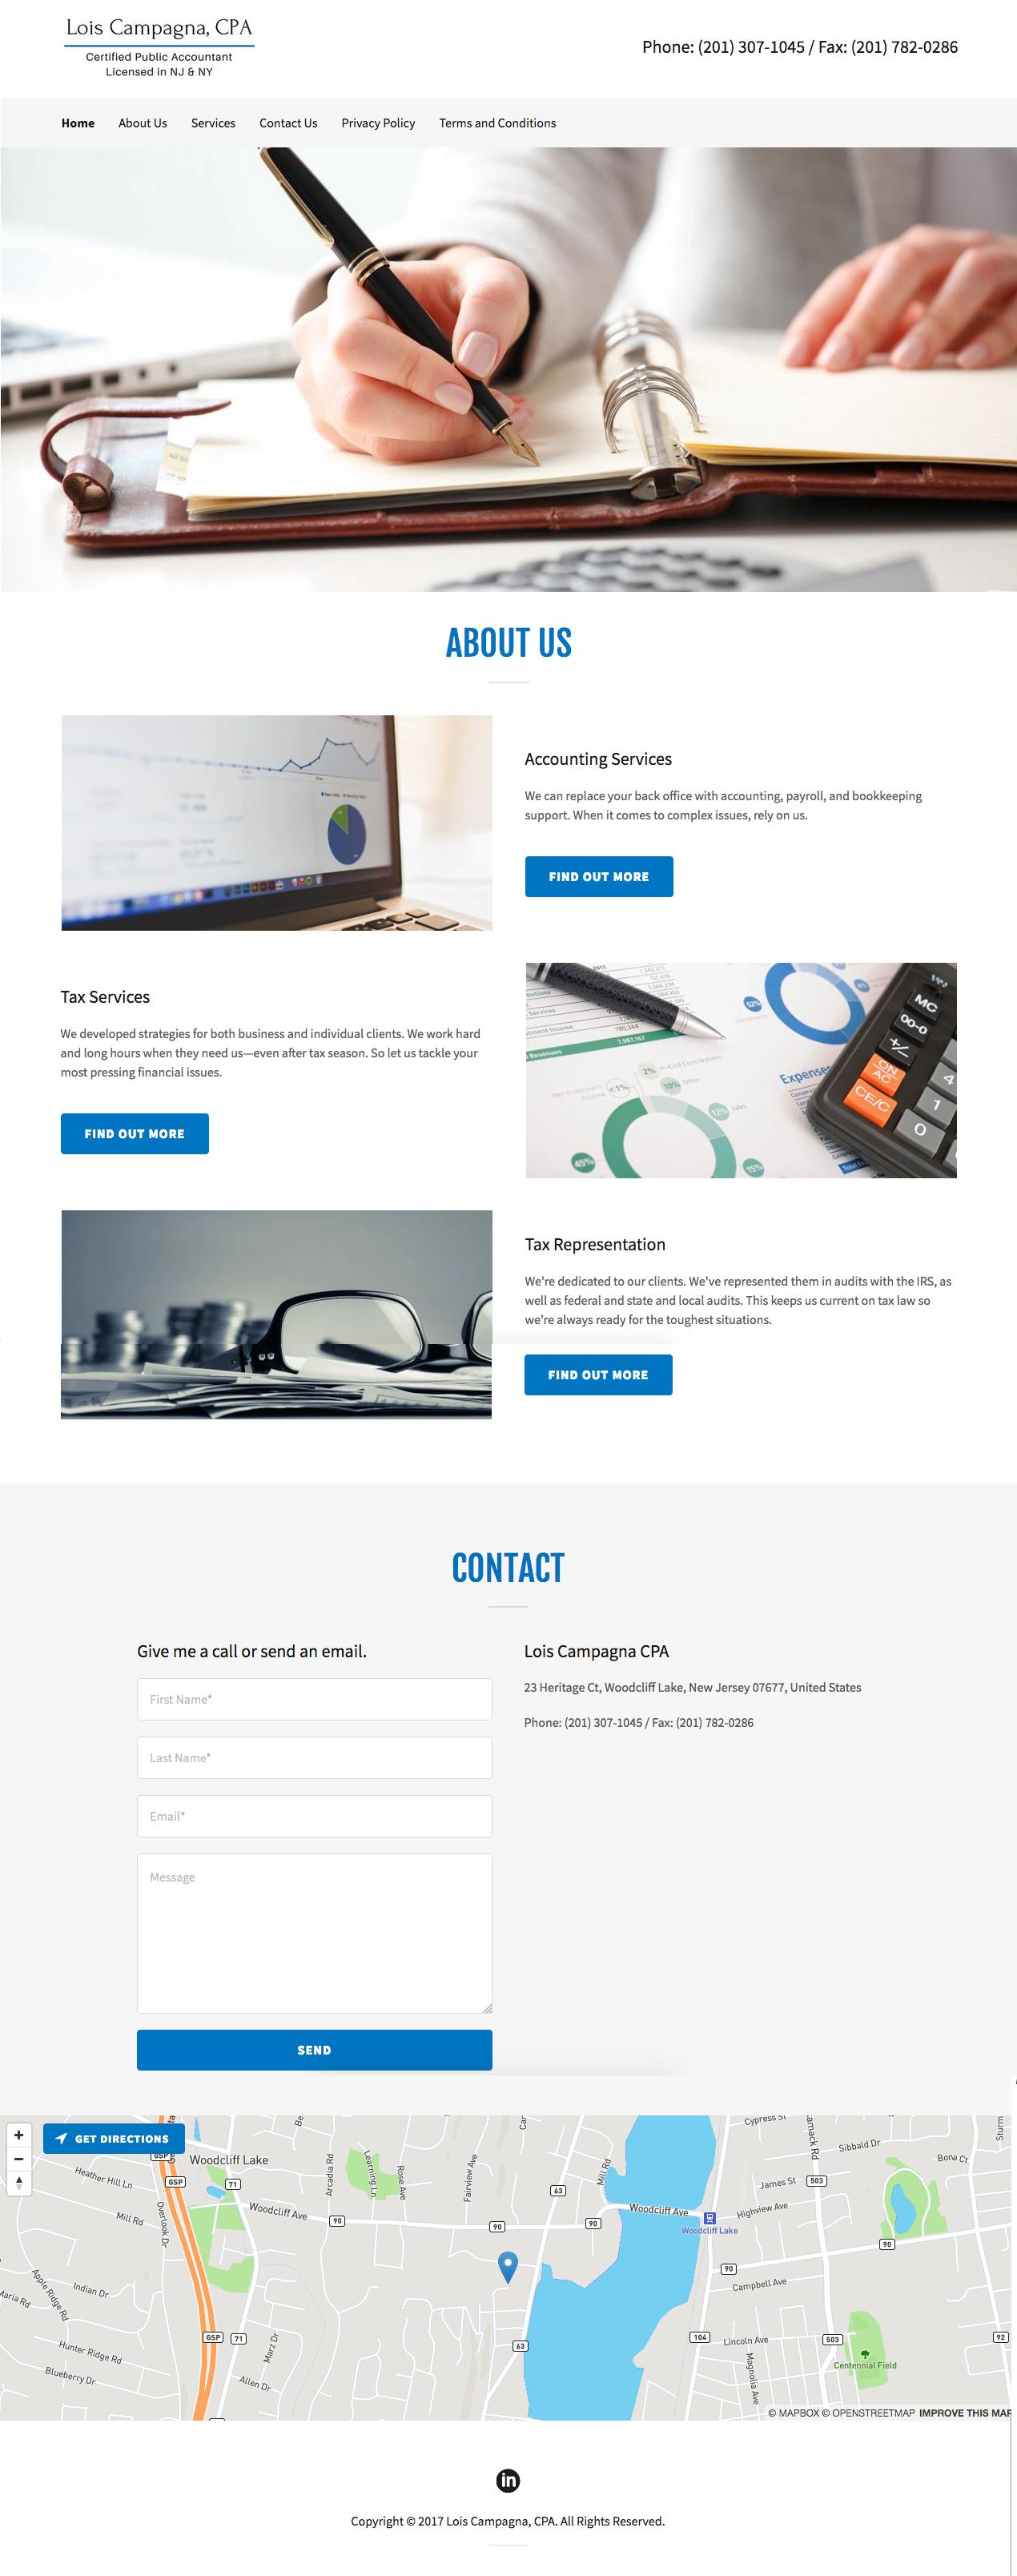 Lois Campagna website home